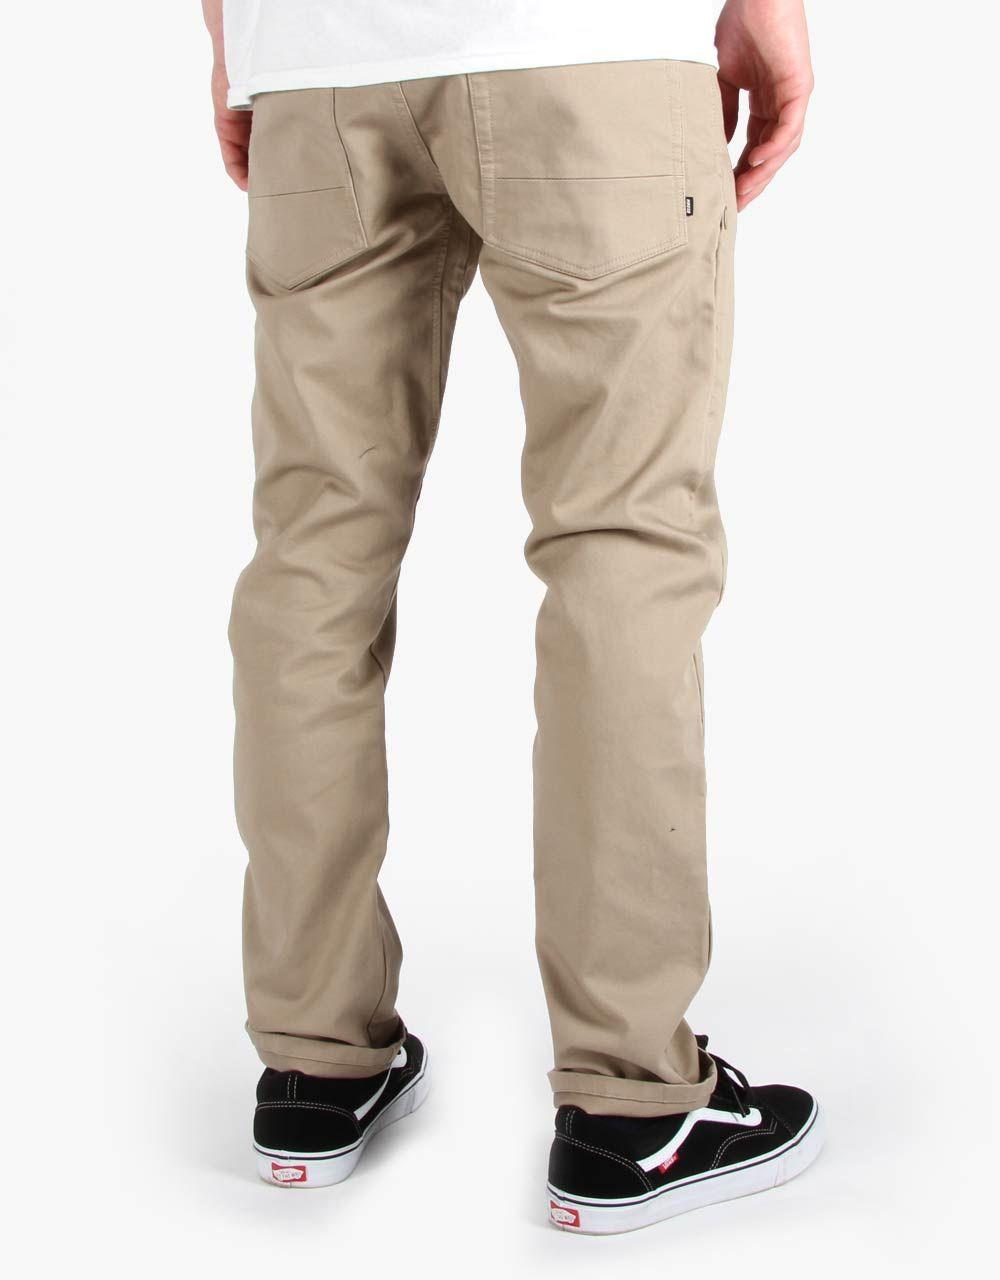 55295319250de6 Nike SB FTM 5-Pocket Pants - Khaki - RouteOne.co.uk | Stylez | Pants ...